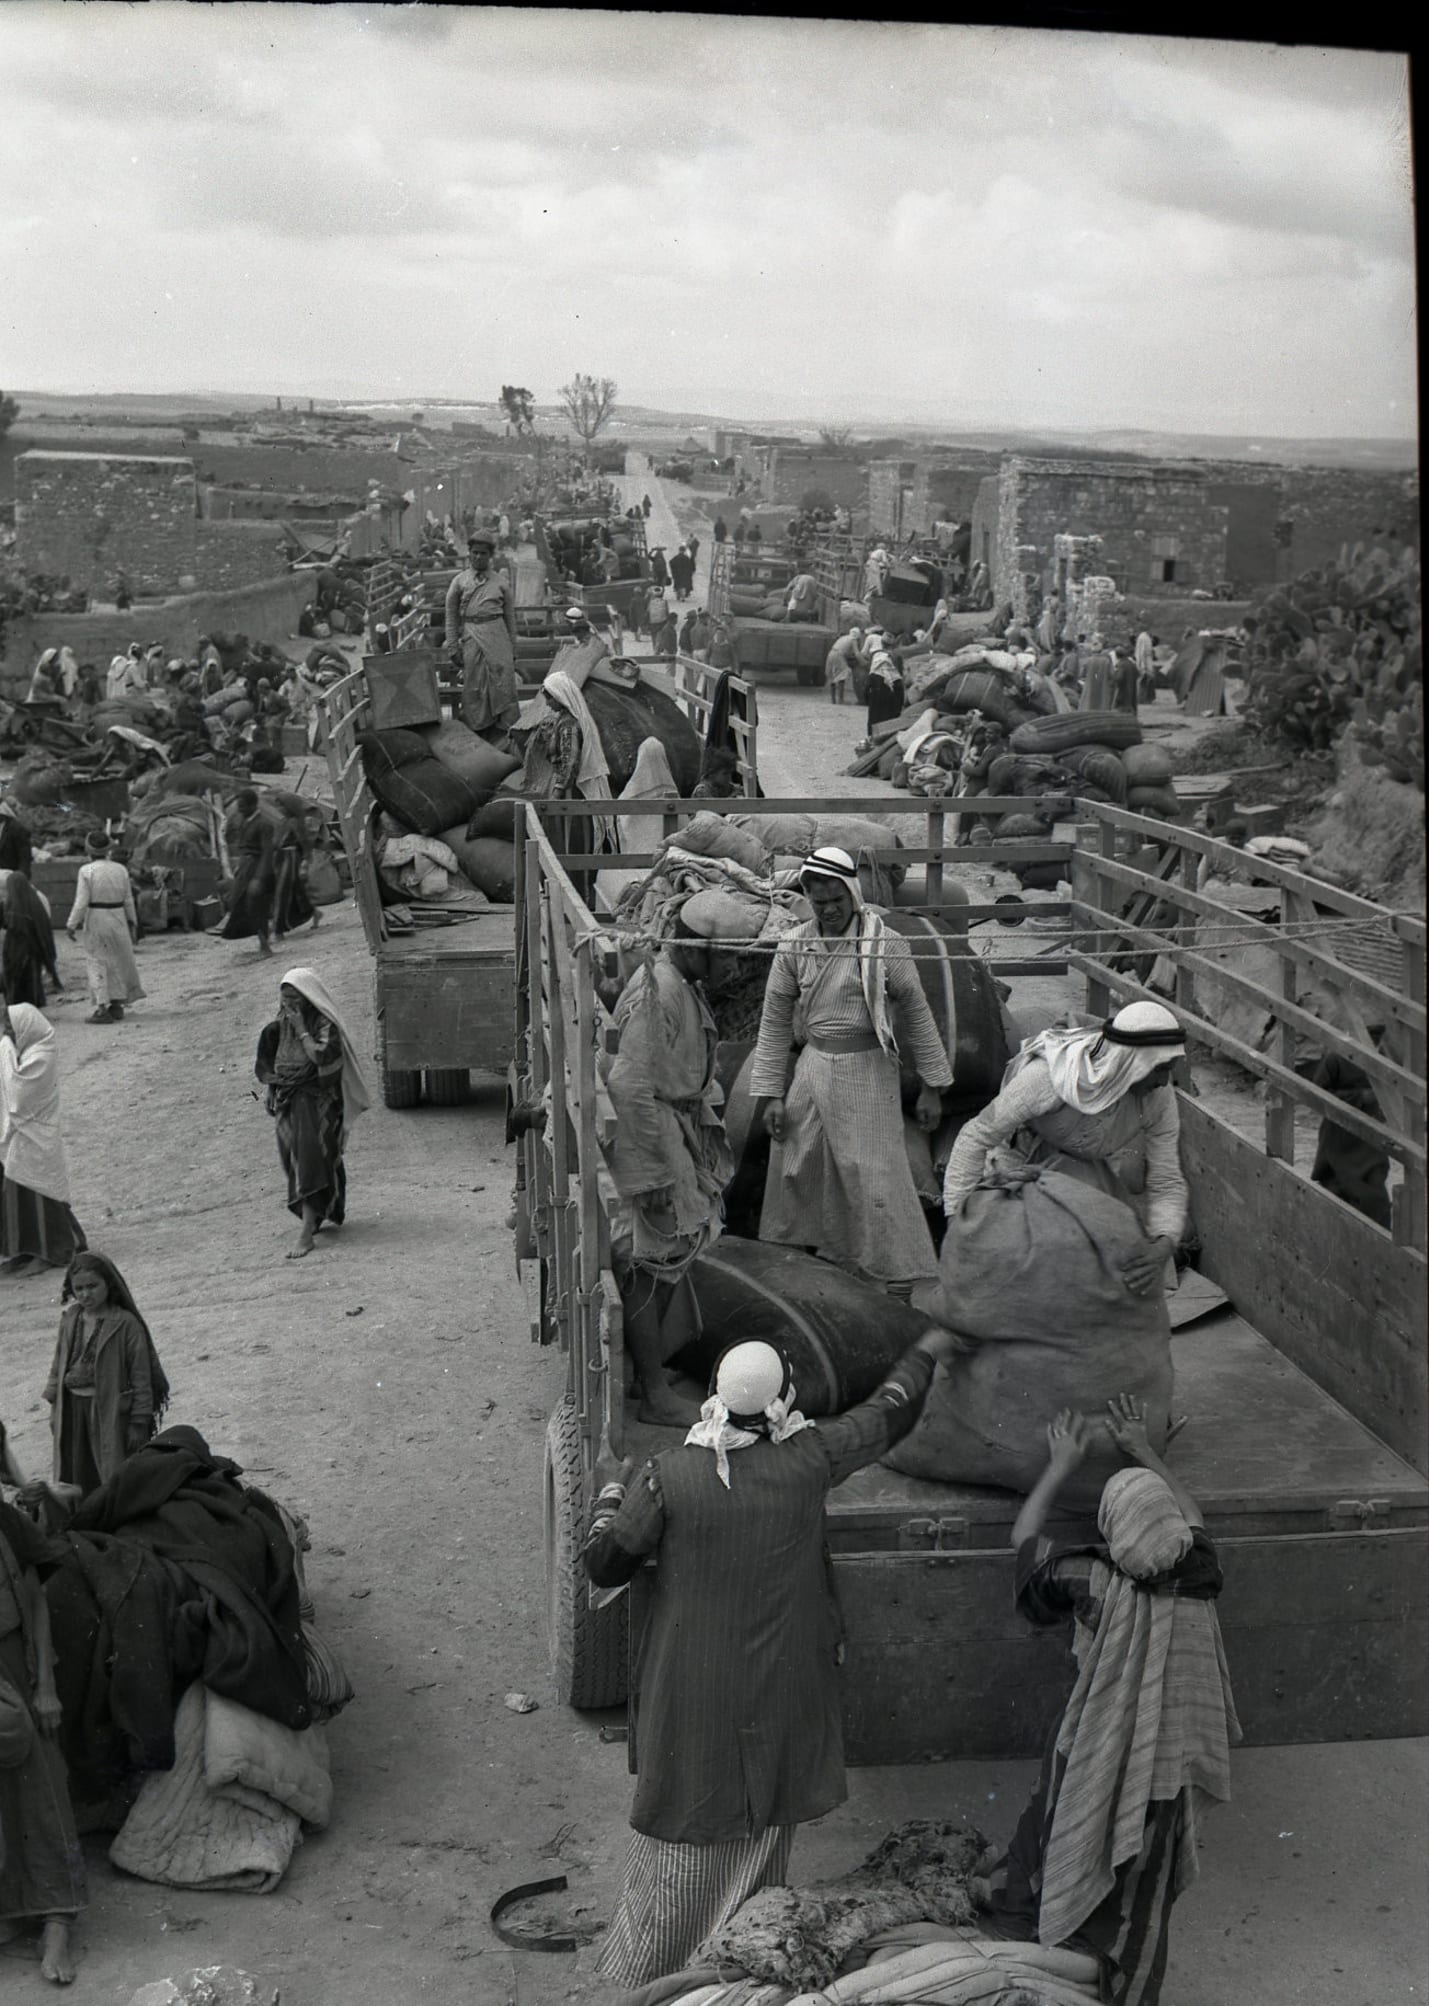 The evacuation of Iraq al-Manshiyya, near today's Kiryat Gat, in March, 1949.